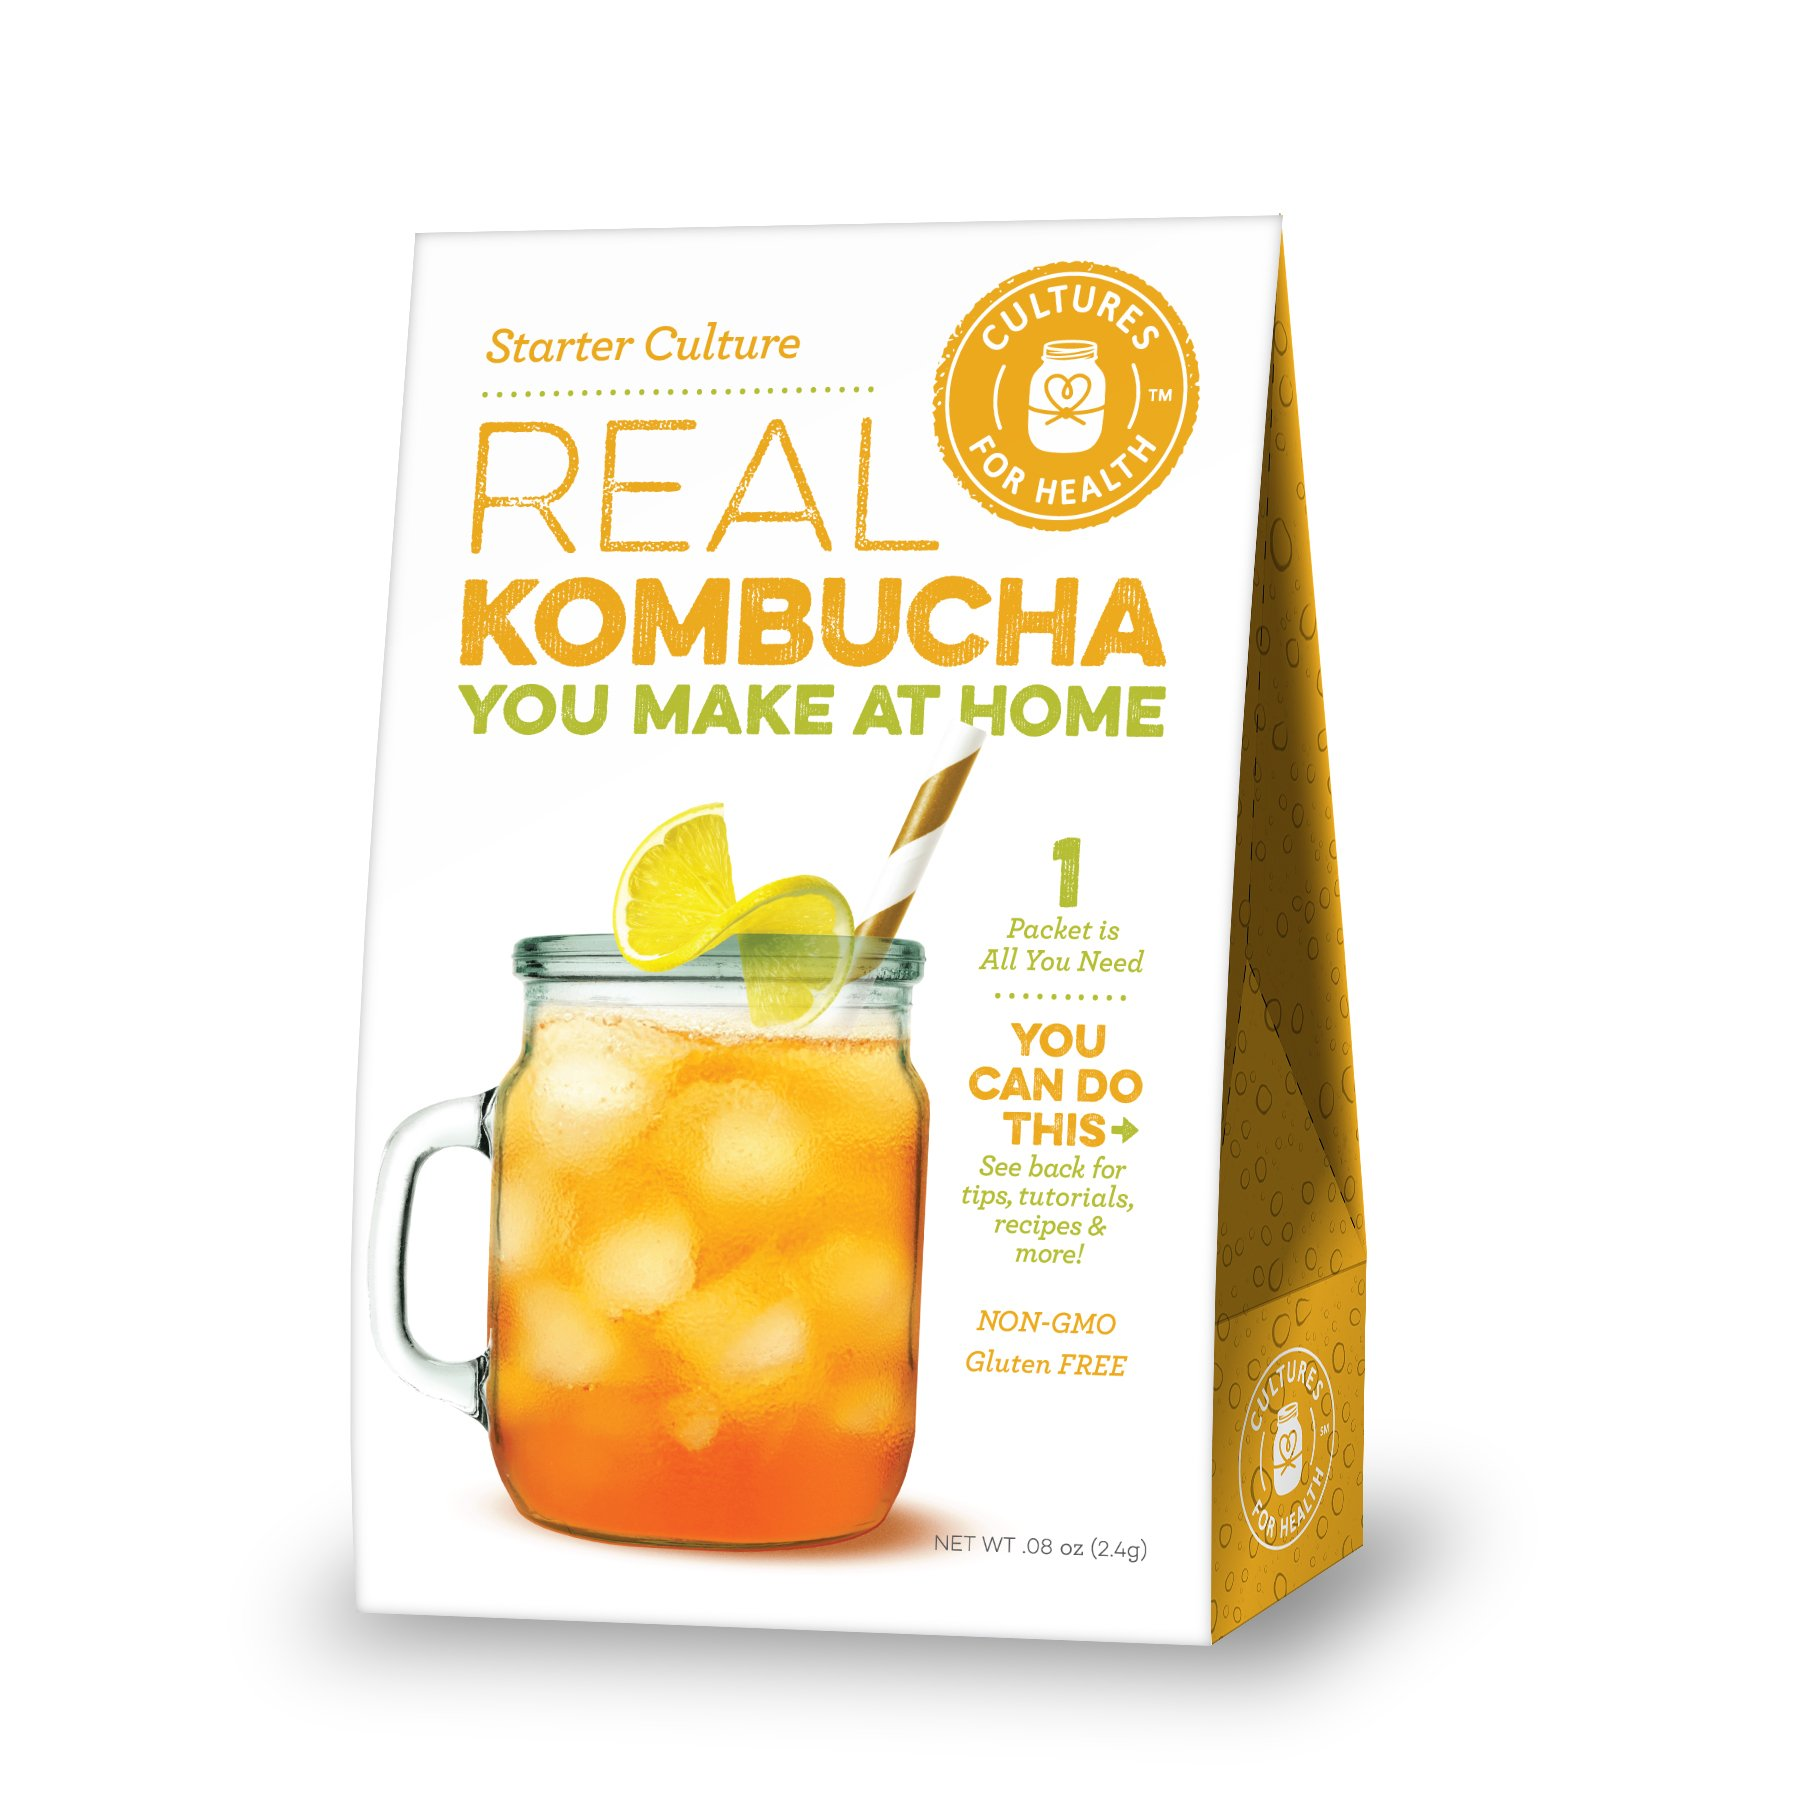 Kombucha - Starter Culture - SCOBY for homemade sparkling probiotic tea, heirloom, non-GMO